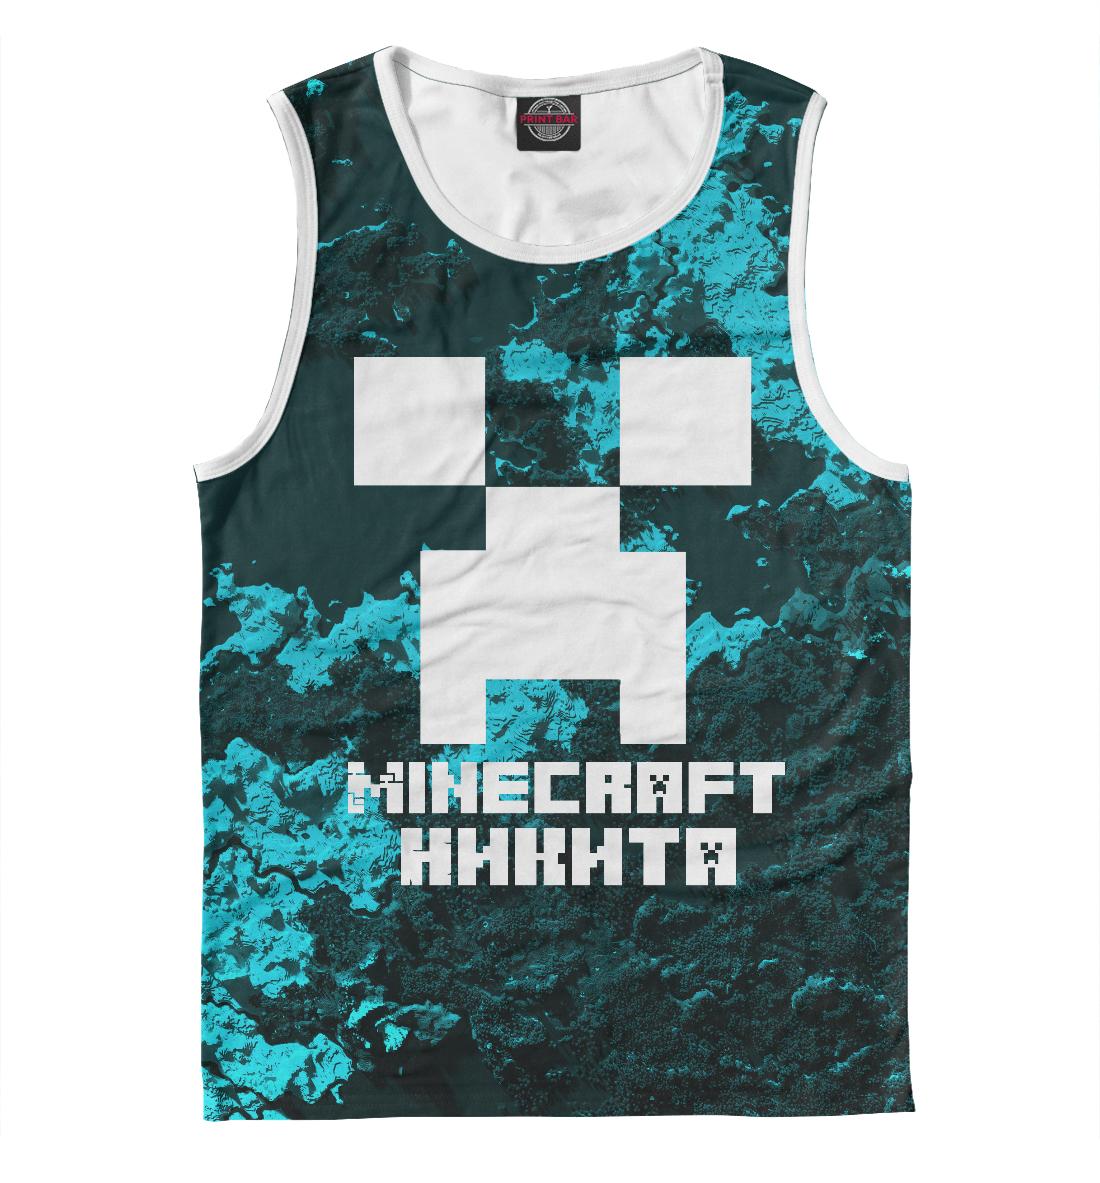 Купить Никита-Minecraft, Printbar, Майки, NIK-511667-may-2